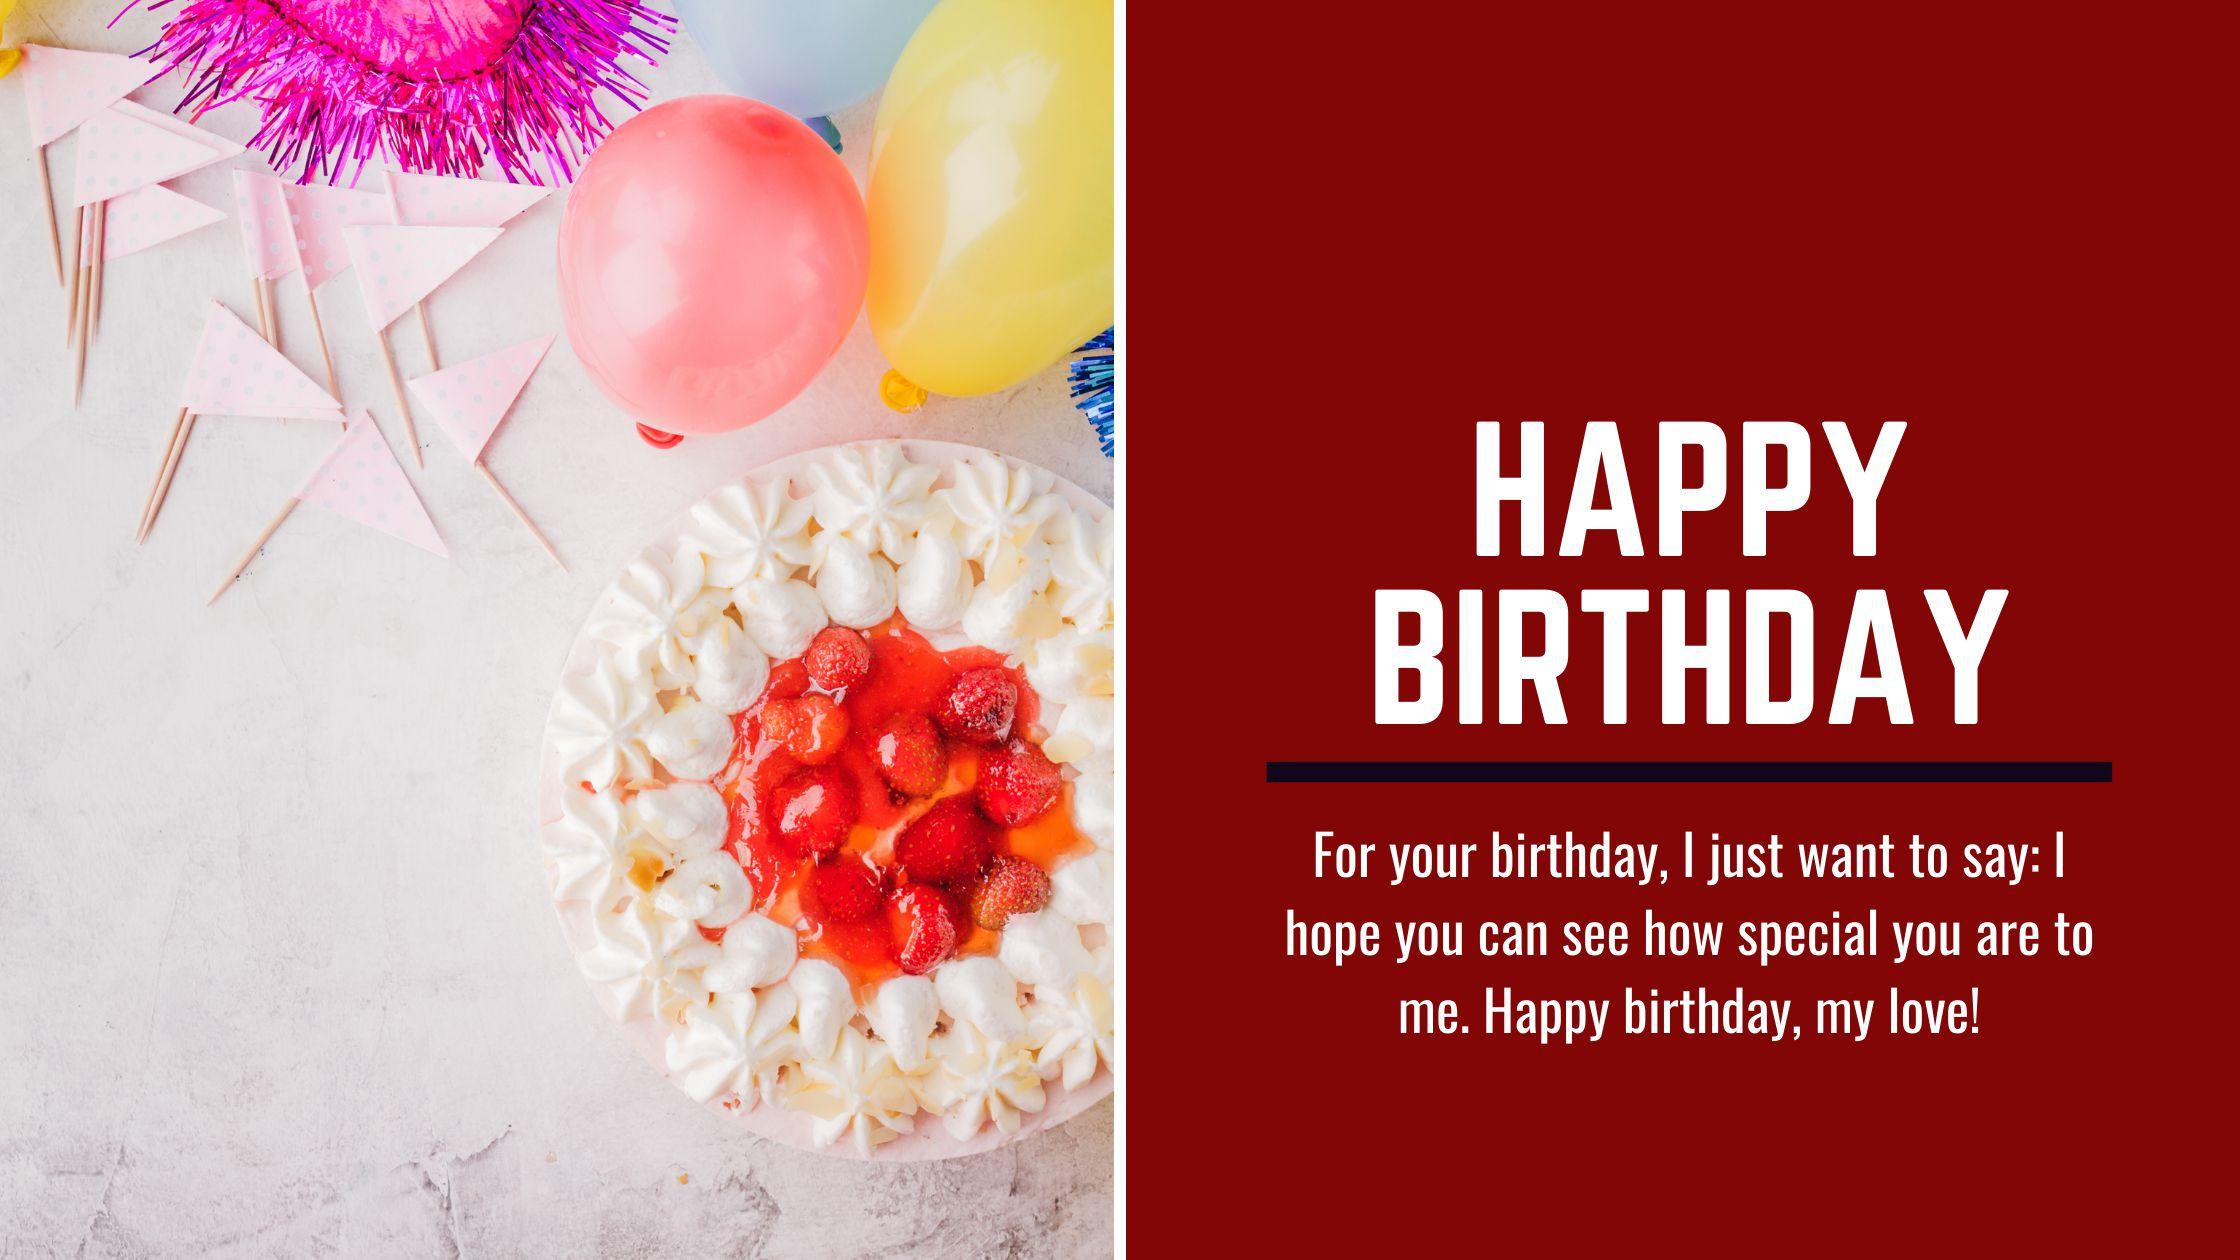 birthday-wishes-for-best-friend